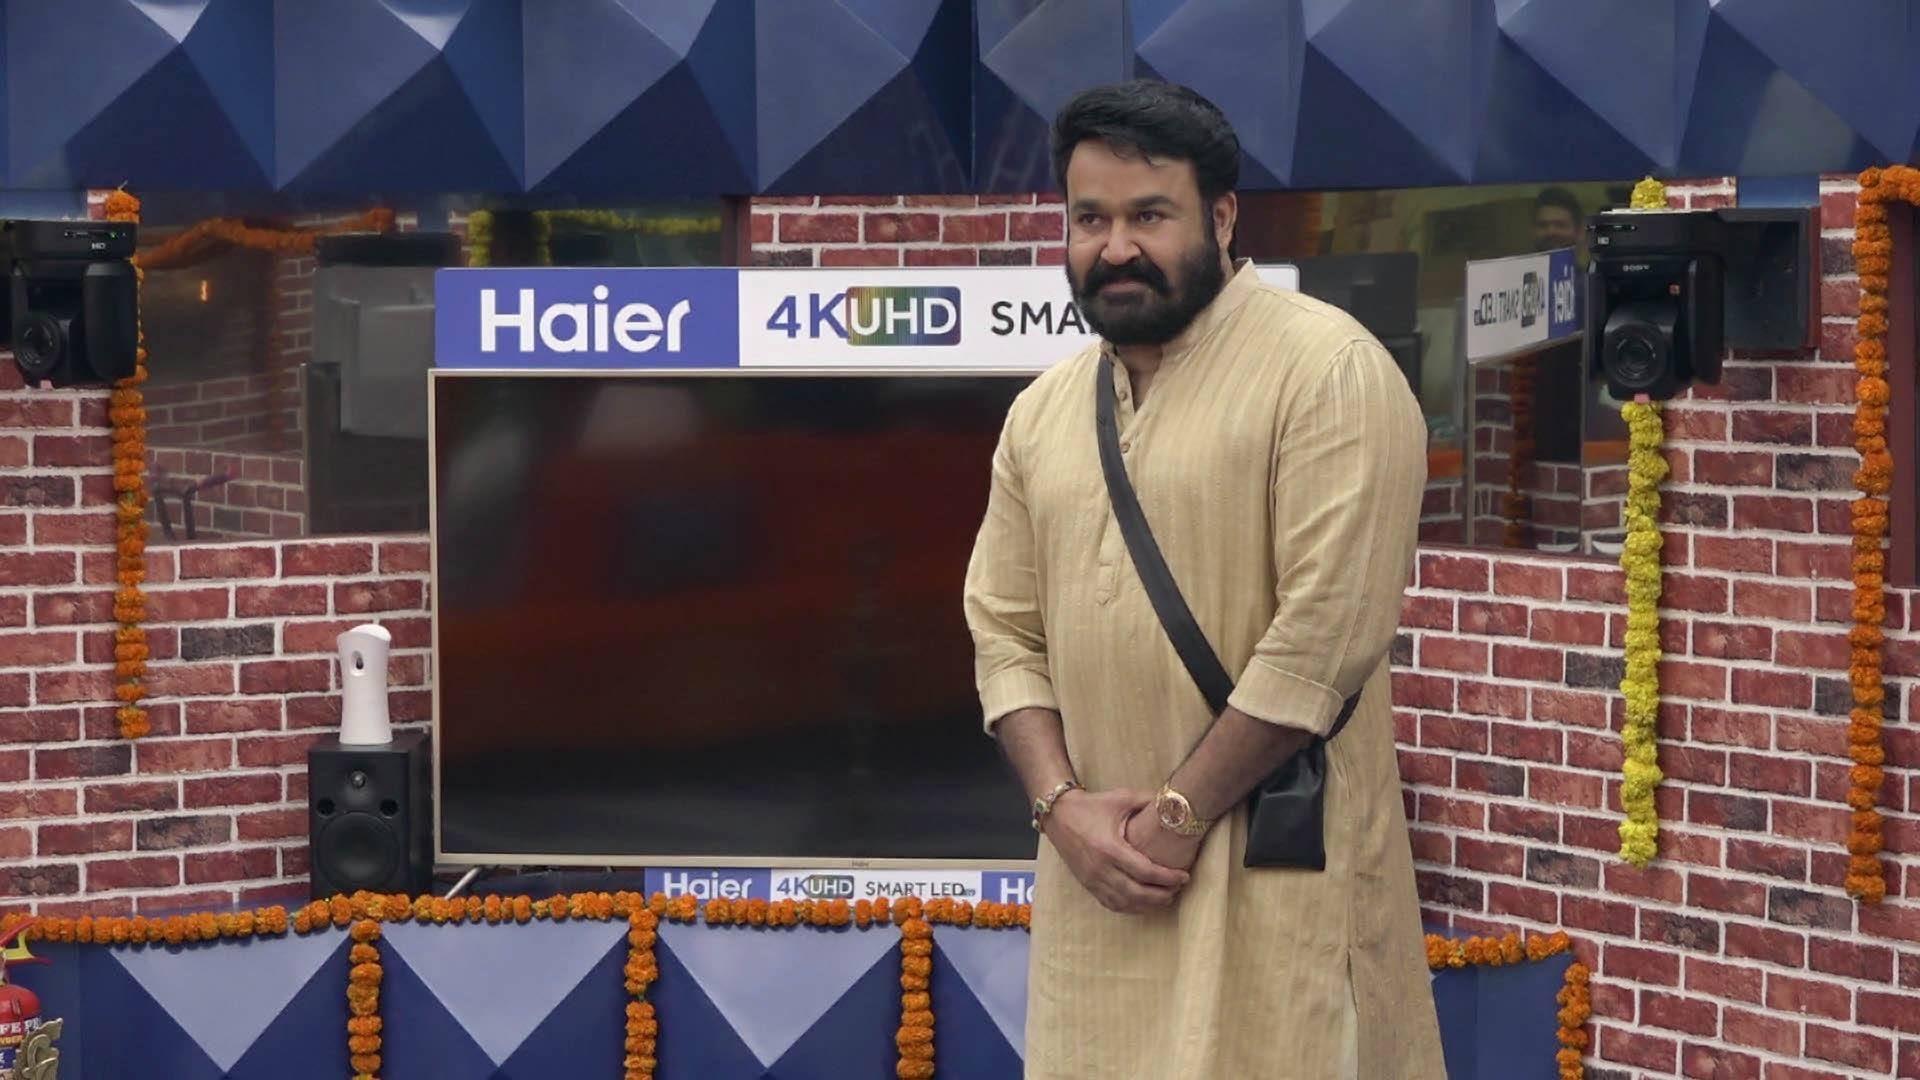 Bigg Boss - Season 1 Episode 63 : Day 62: Mohanlal Enters the House